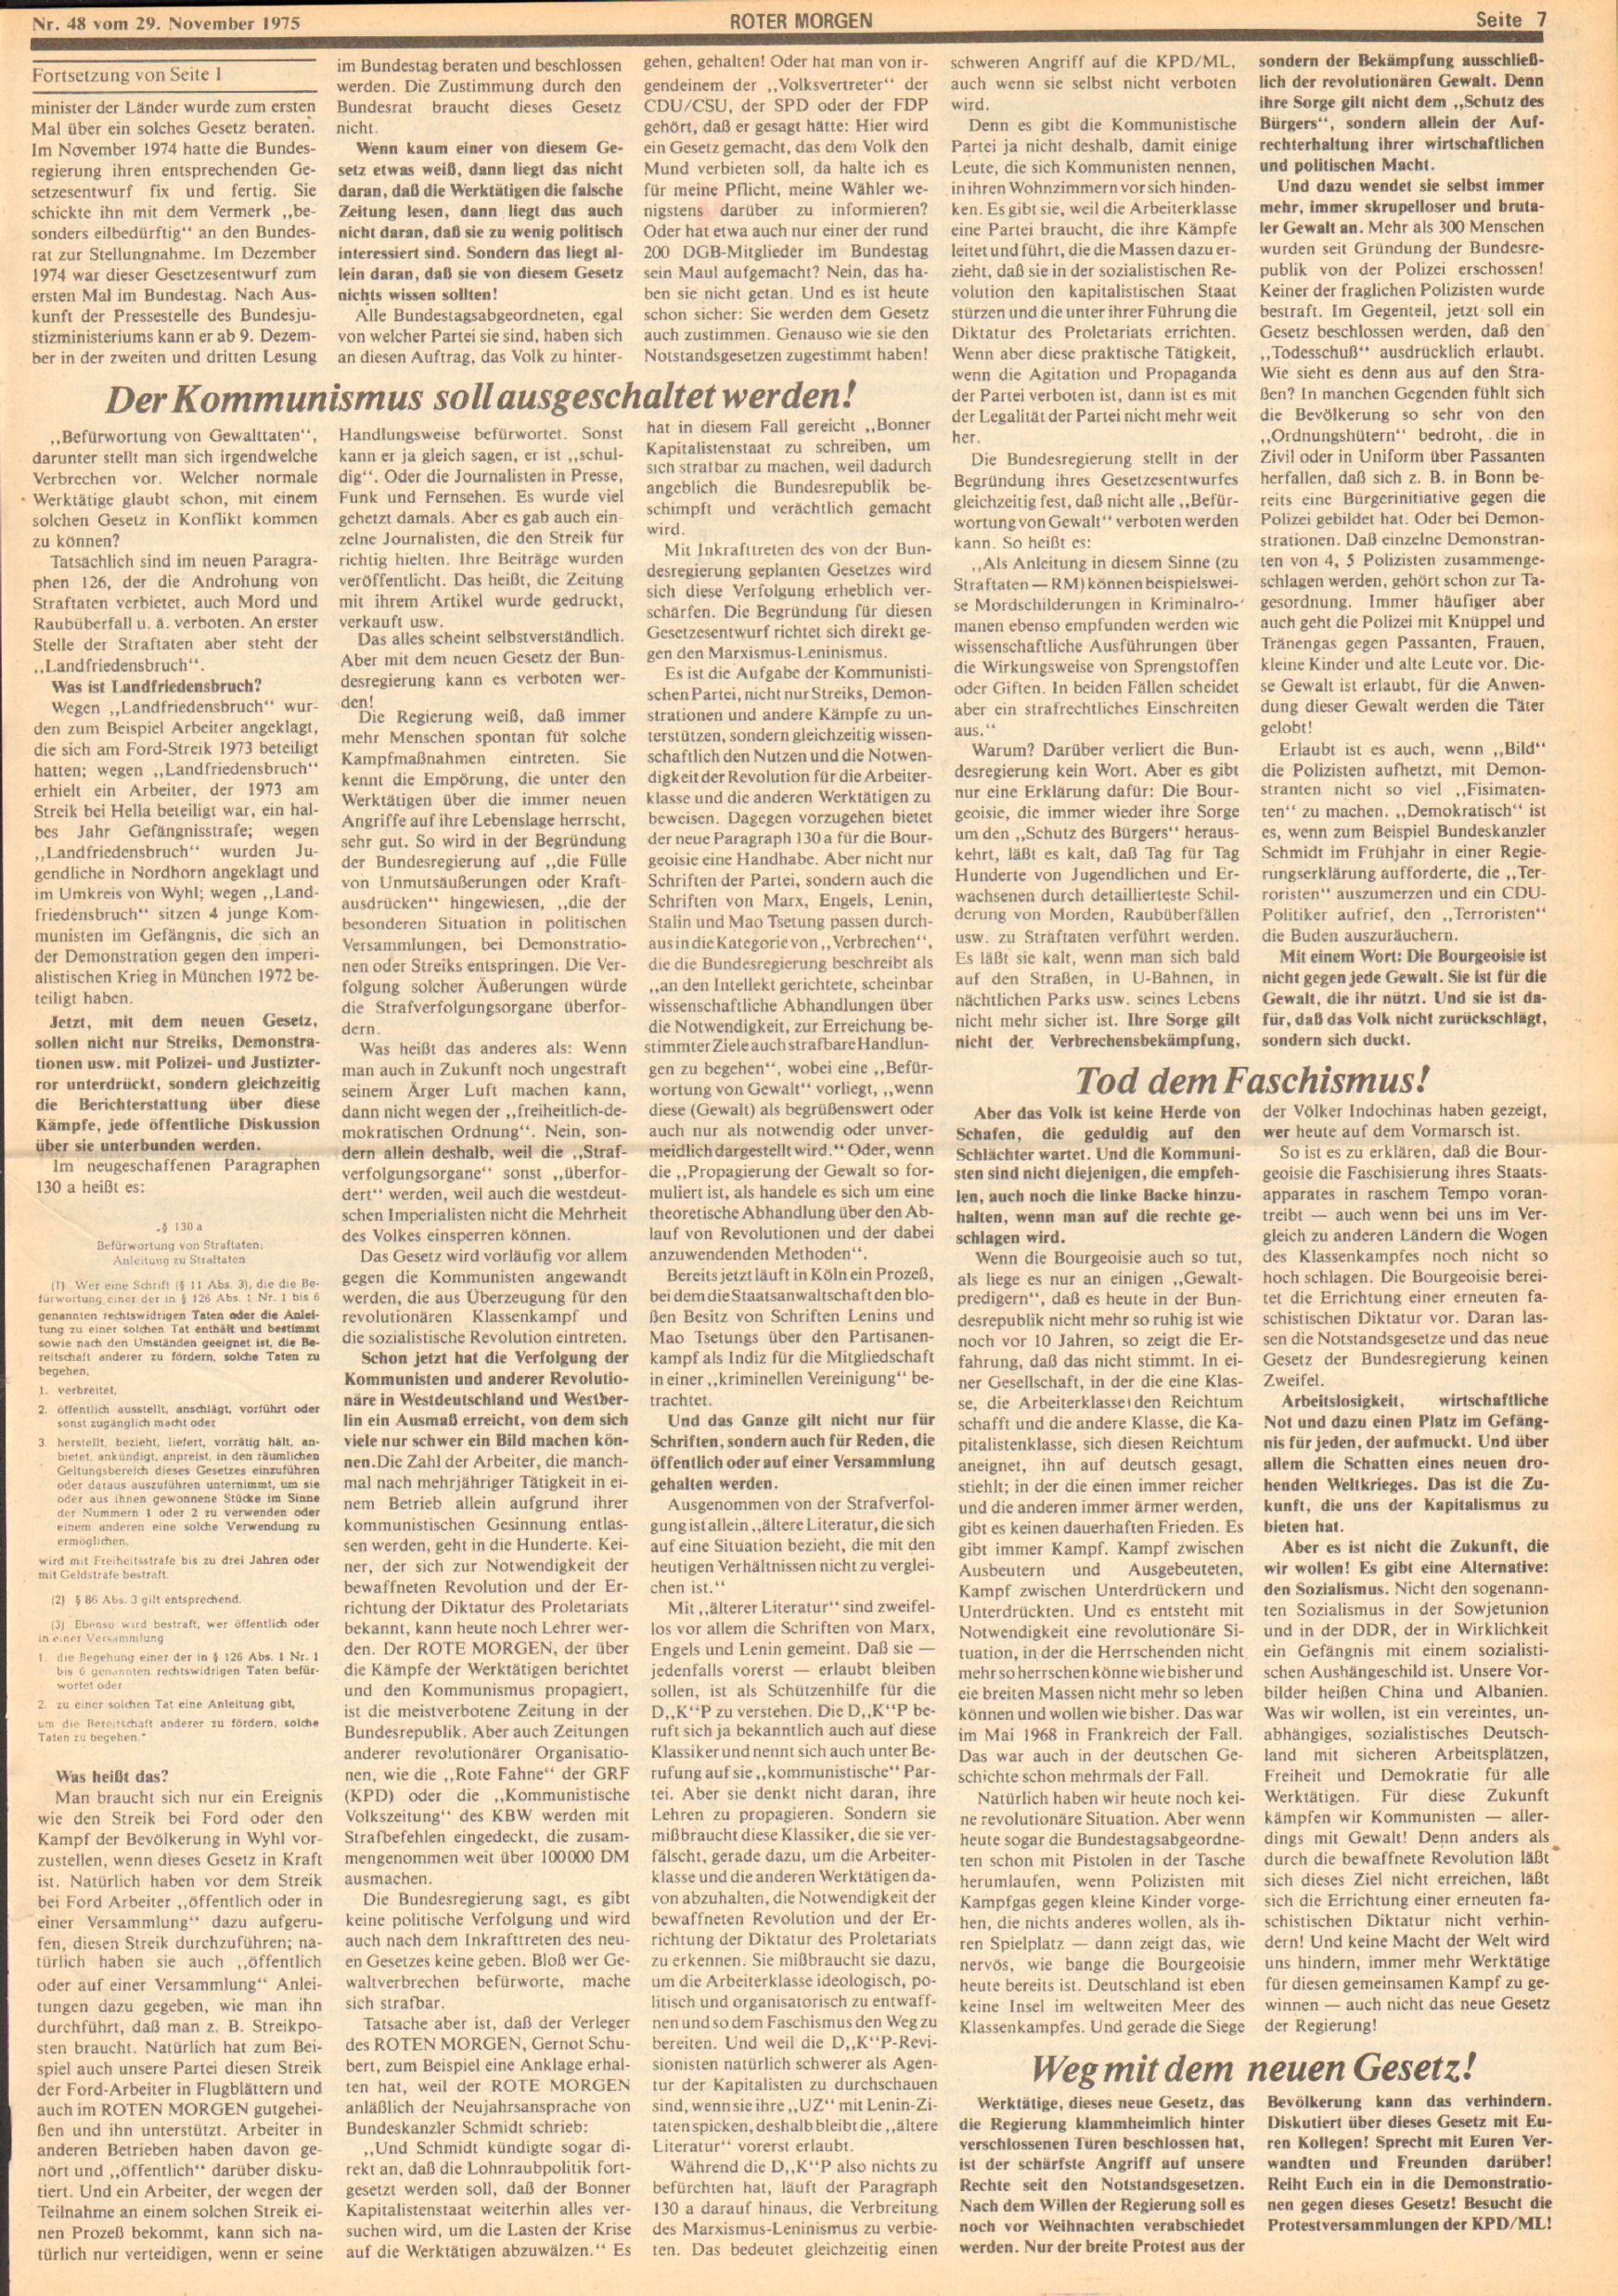 Roter Morgen, 9. Jg., 29. November 1975, Nr. 48, Seite 7